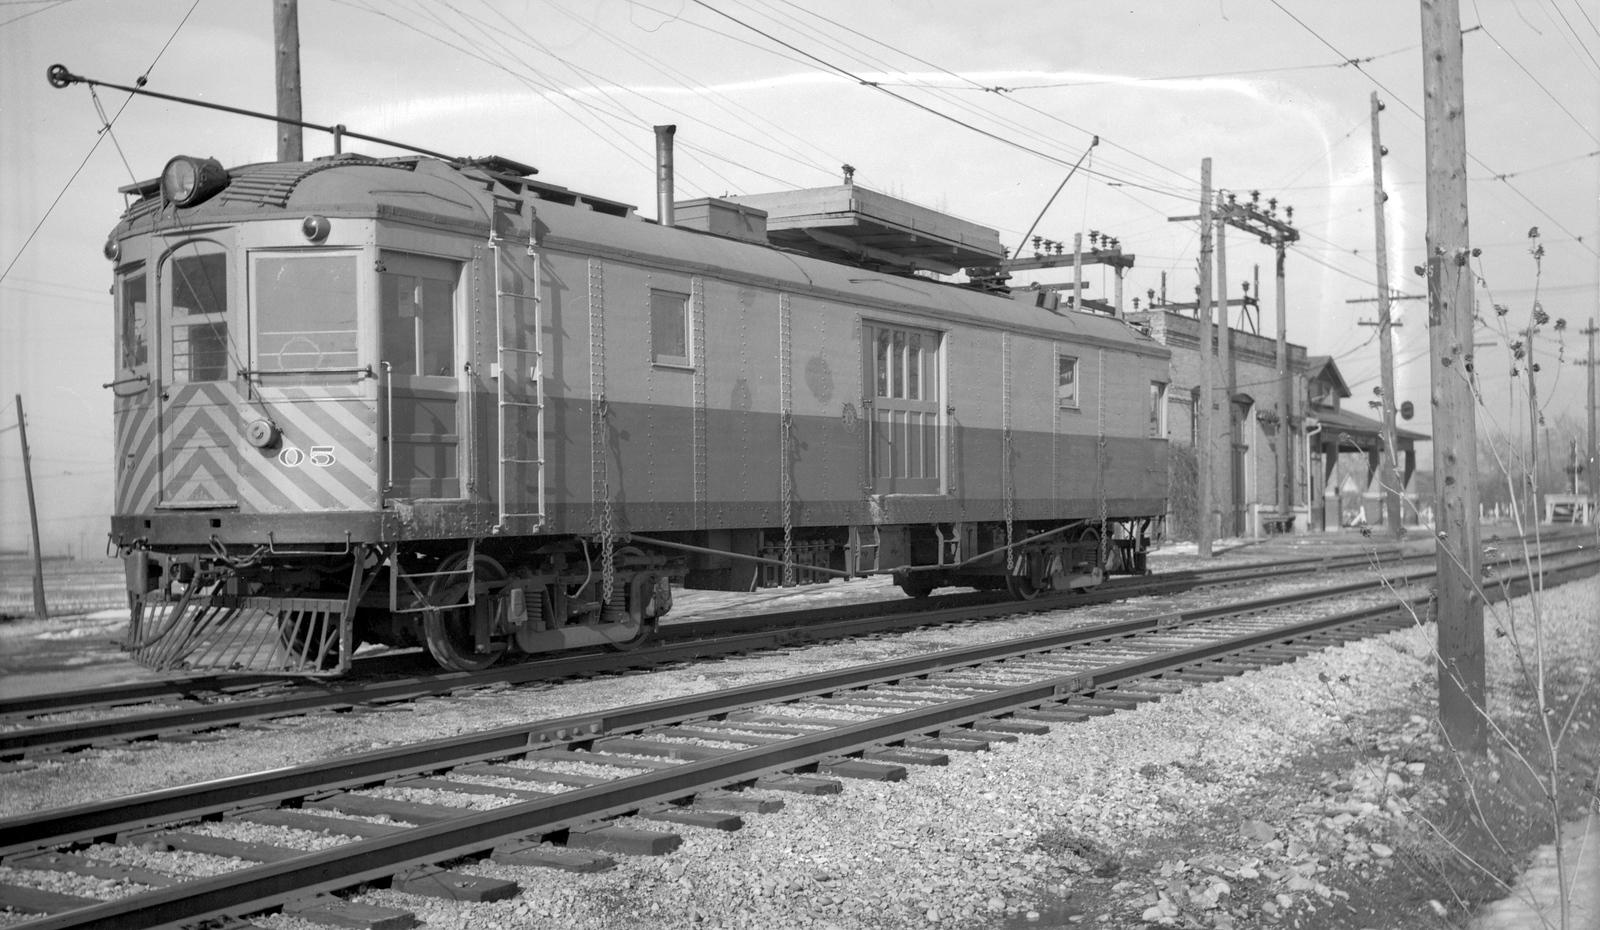 Bamberger_Line-car-05_North-Salt-Lake_0133_Gordon-Cardall-photo